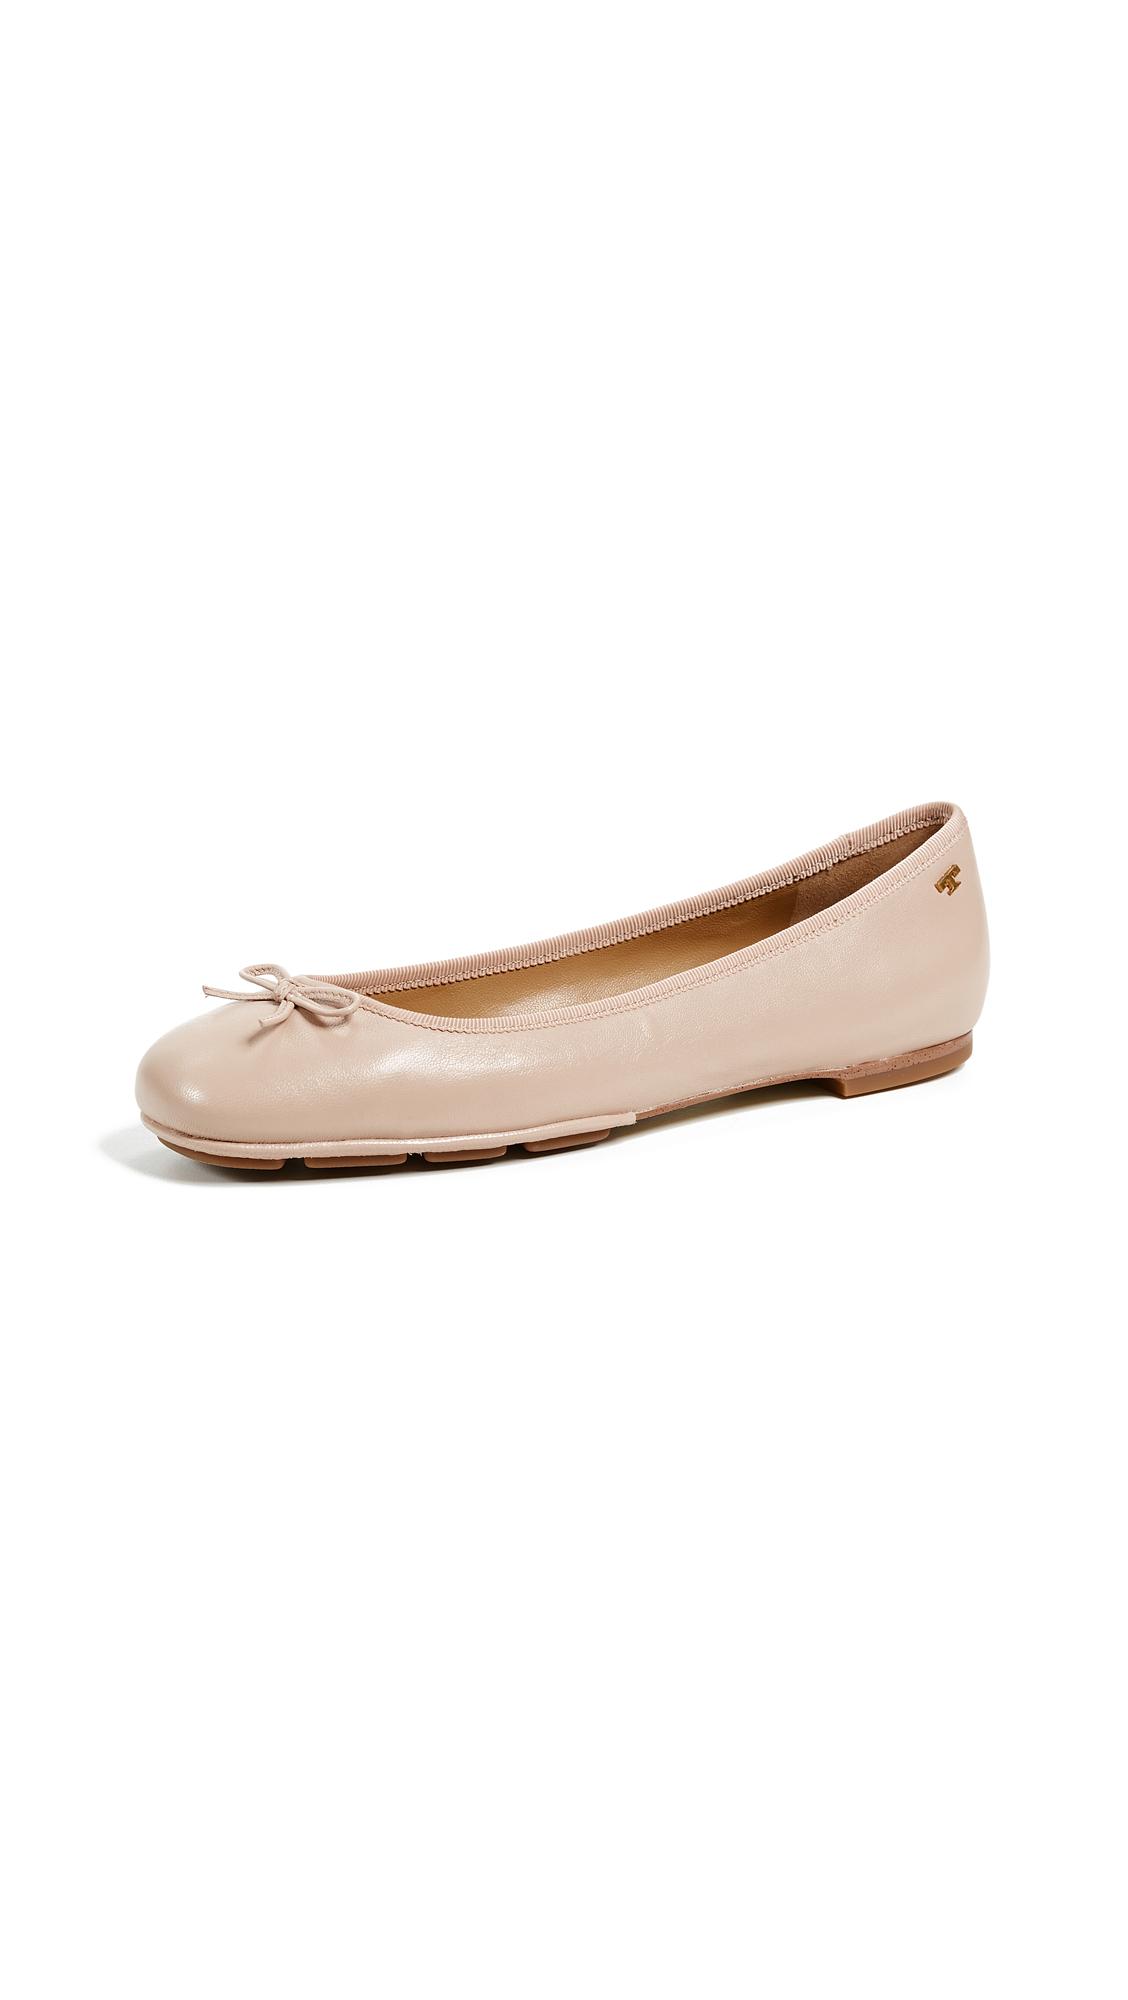 Tory Burch Laila 2 Driver Ballet Flats - Goan Sand/Goan Sand